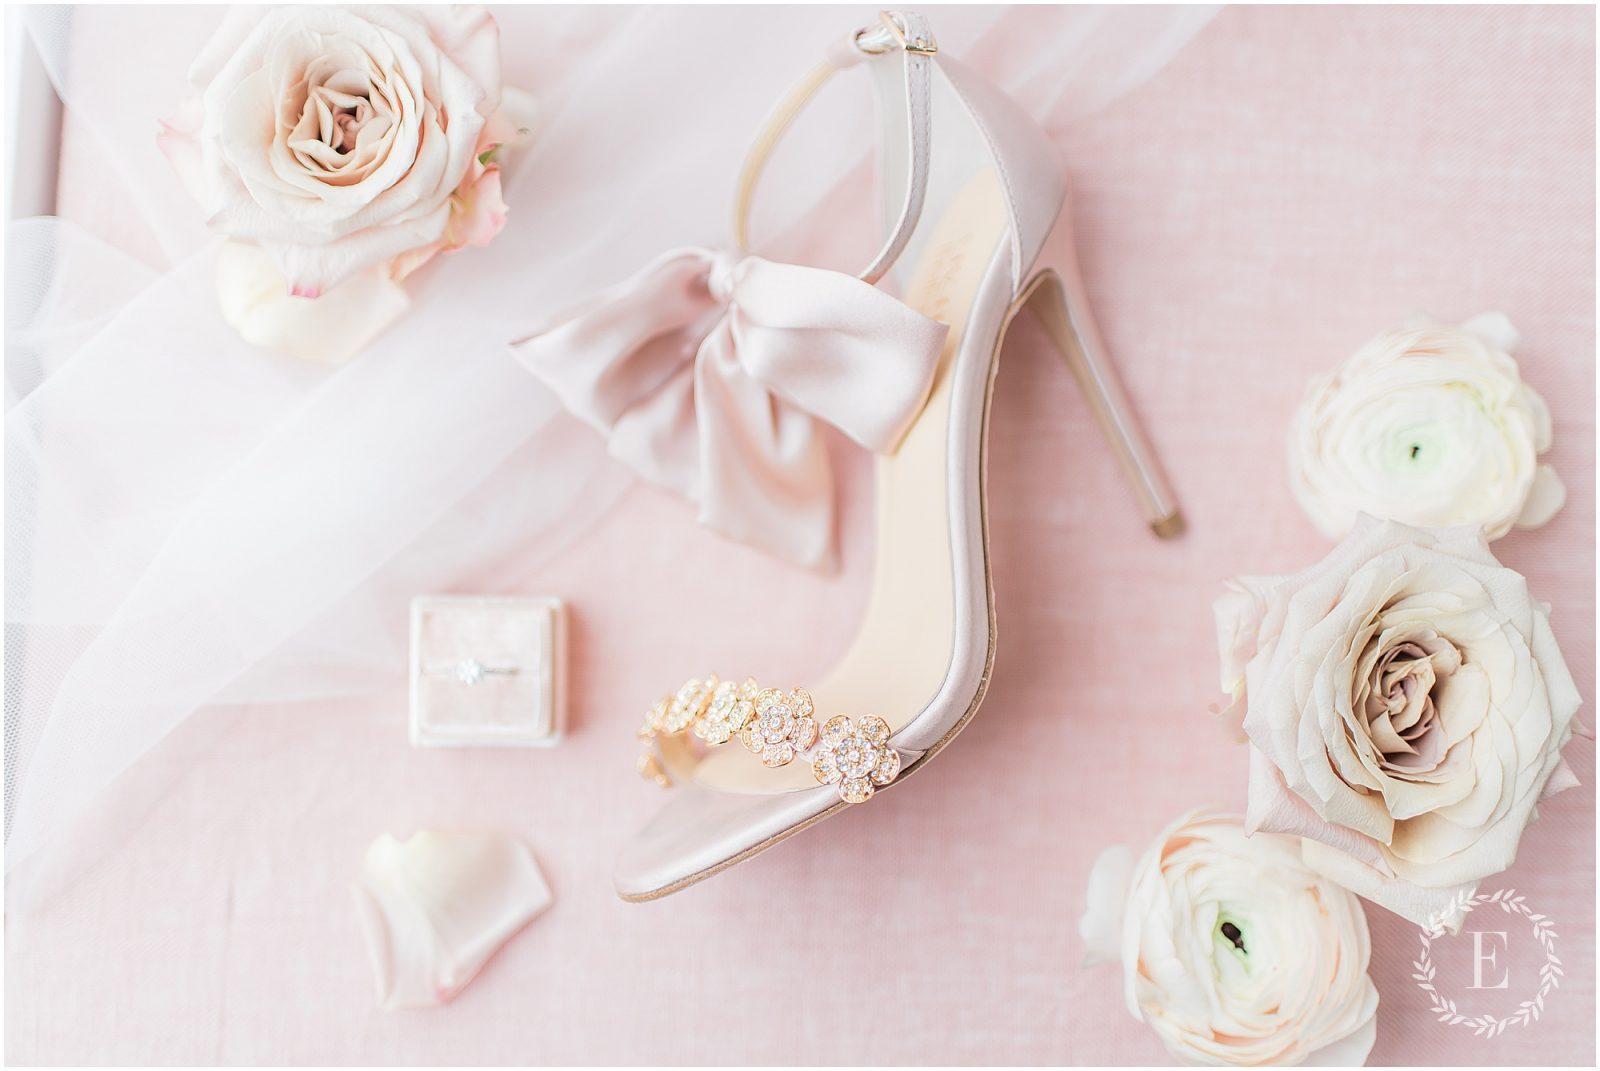 49 - Bella Belle for Fairy Dreams Bridal - PhotosbyEmmaH 2019.jpg